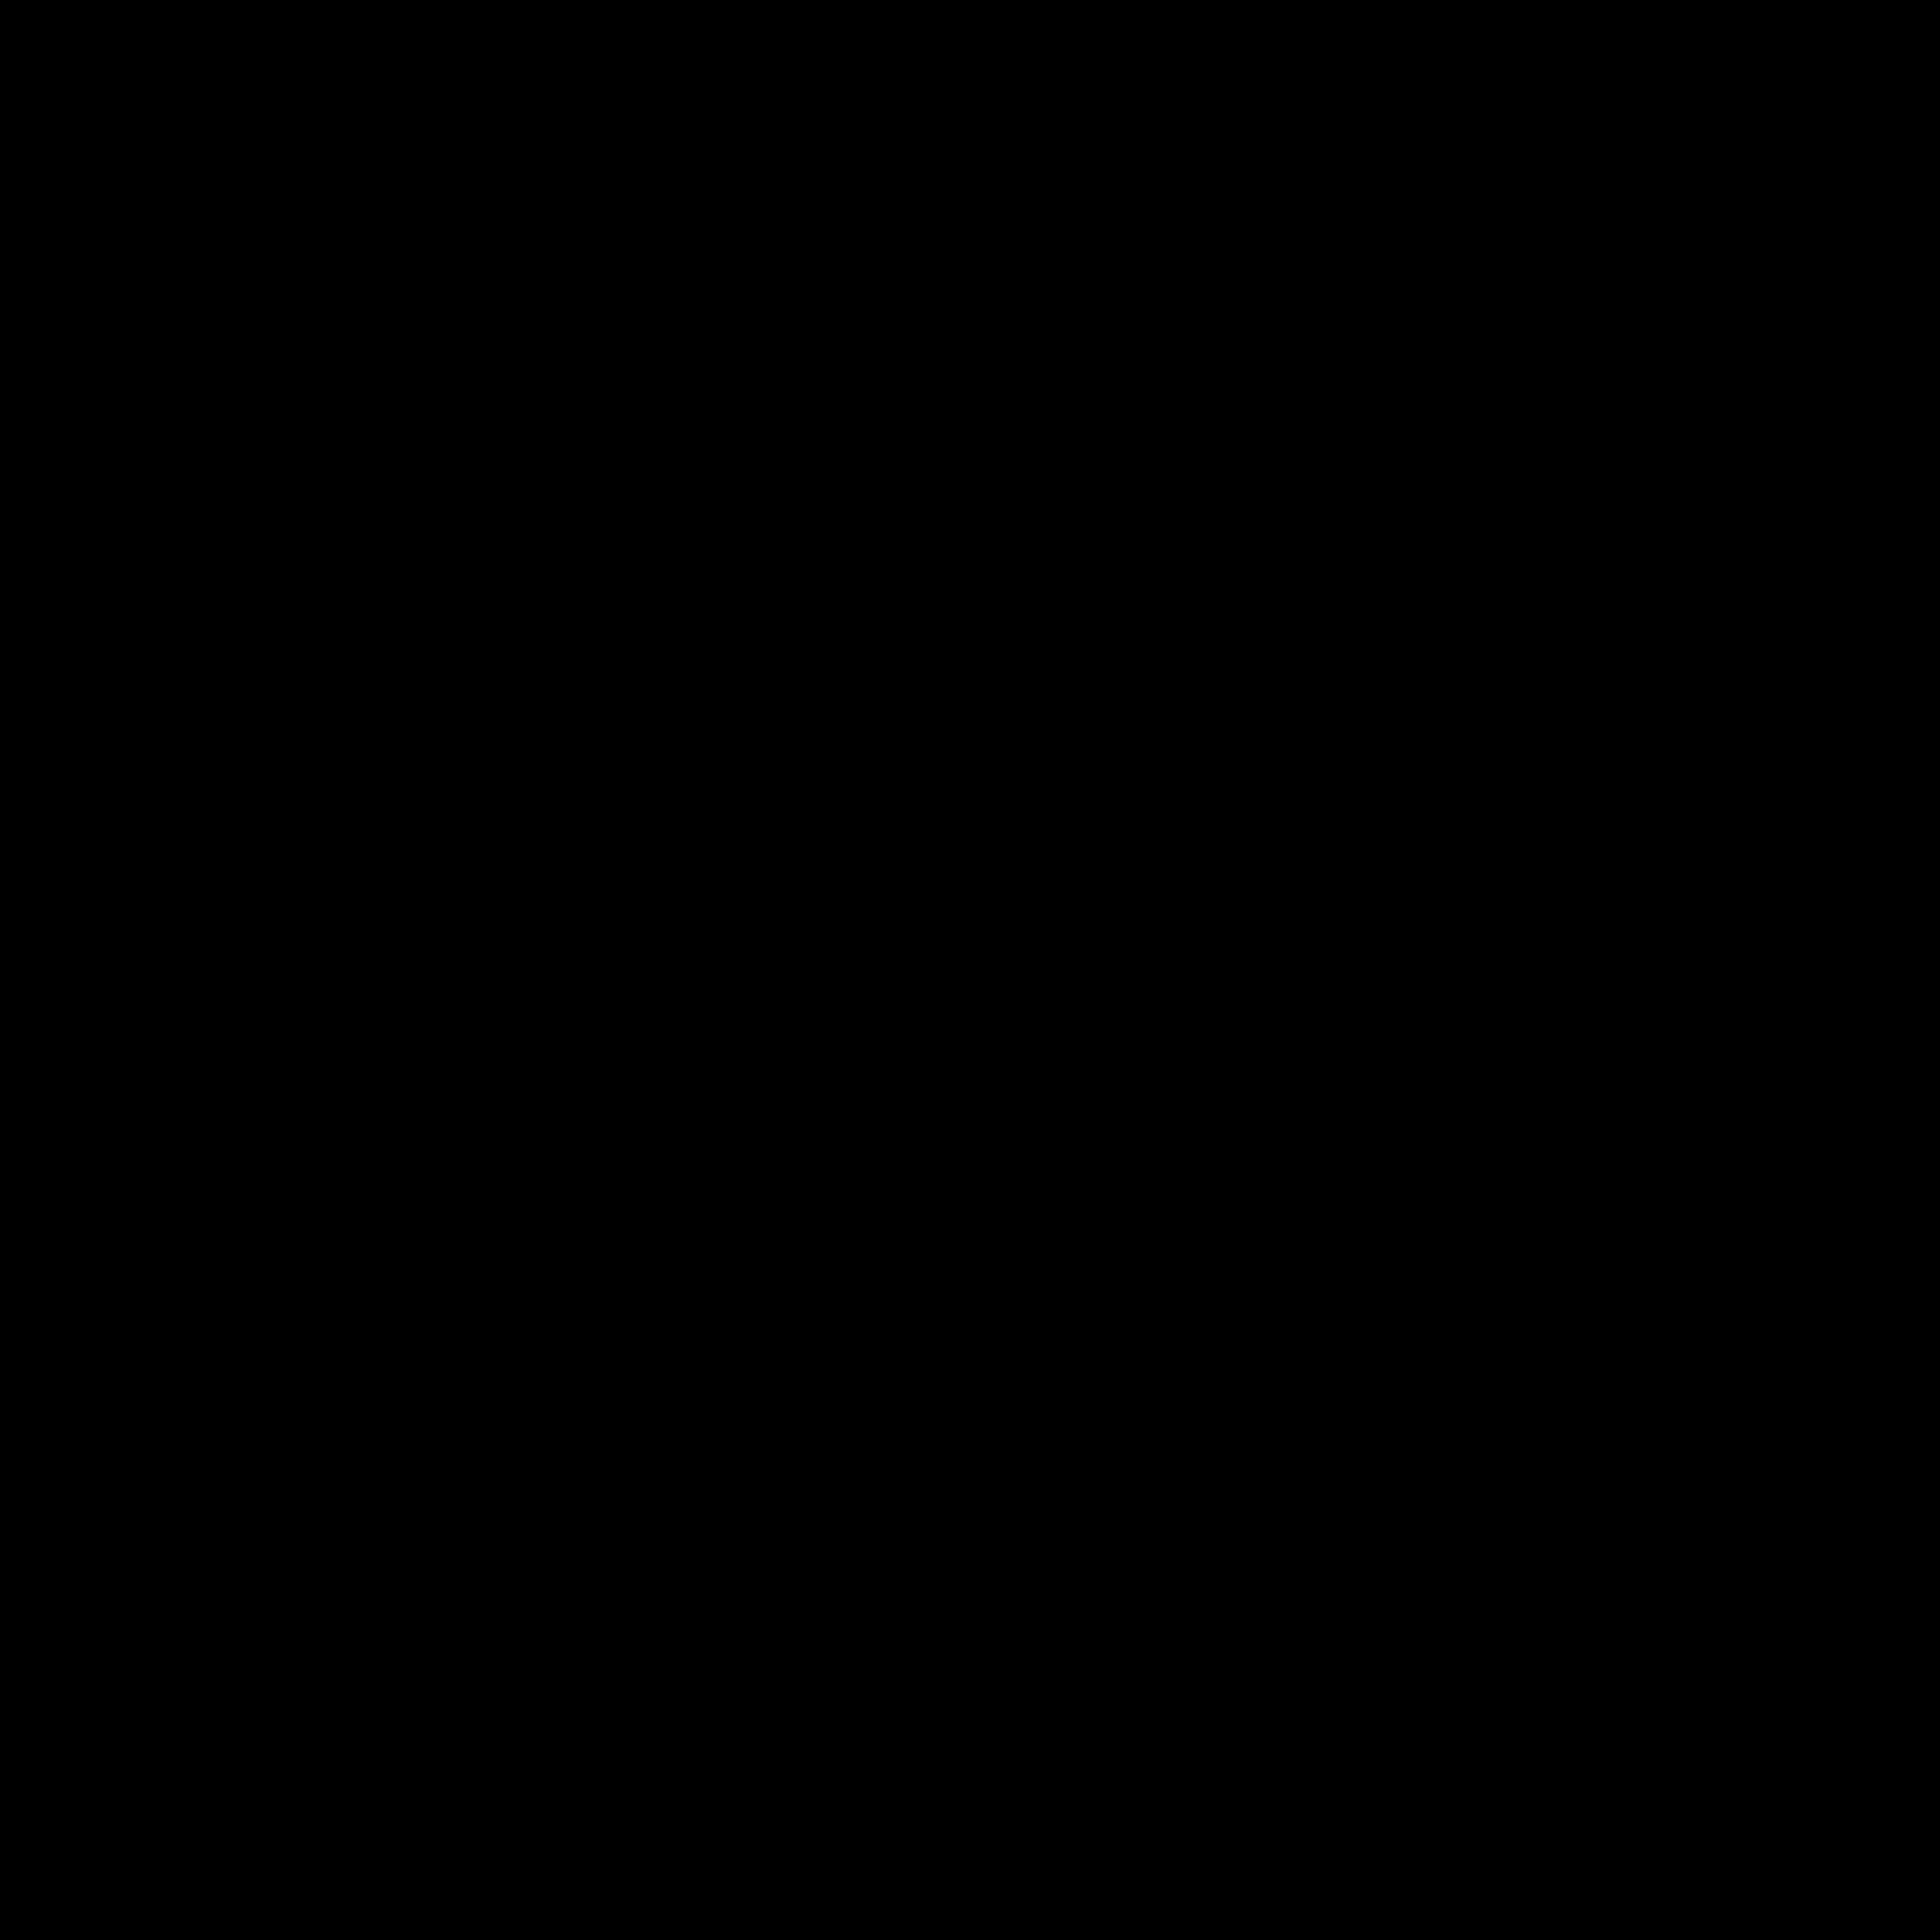 InfoMoney Logo PNG.